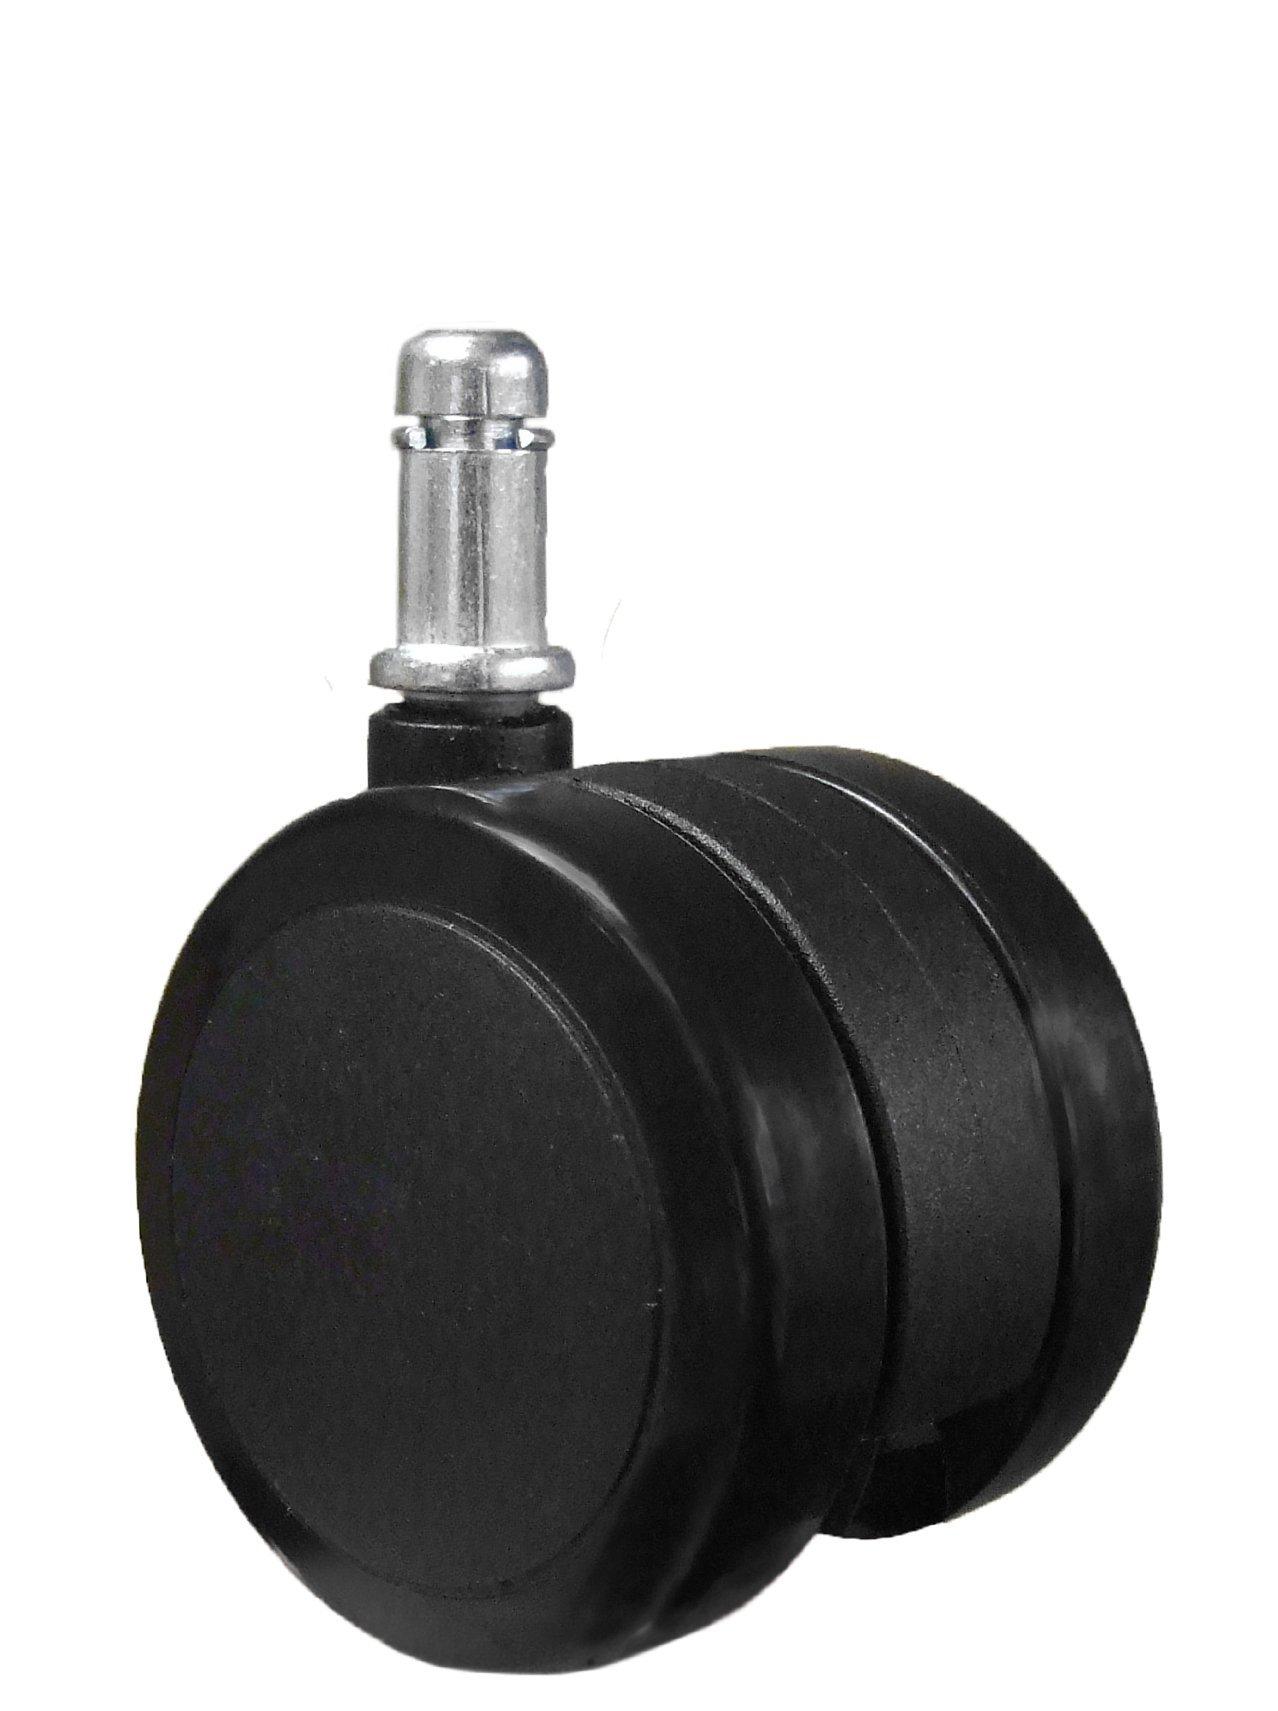 chairpartsonline Soft Caster Wheel Hardwood Floors - 5 Casters Compatible Herman Miller Aeron